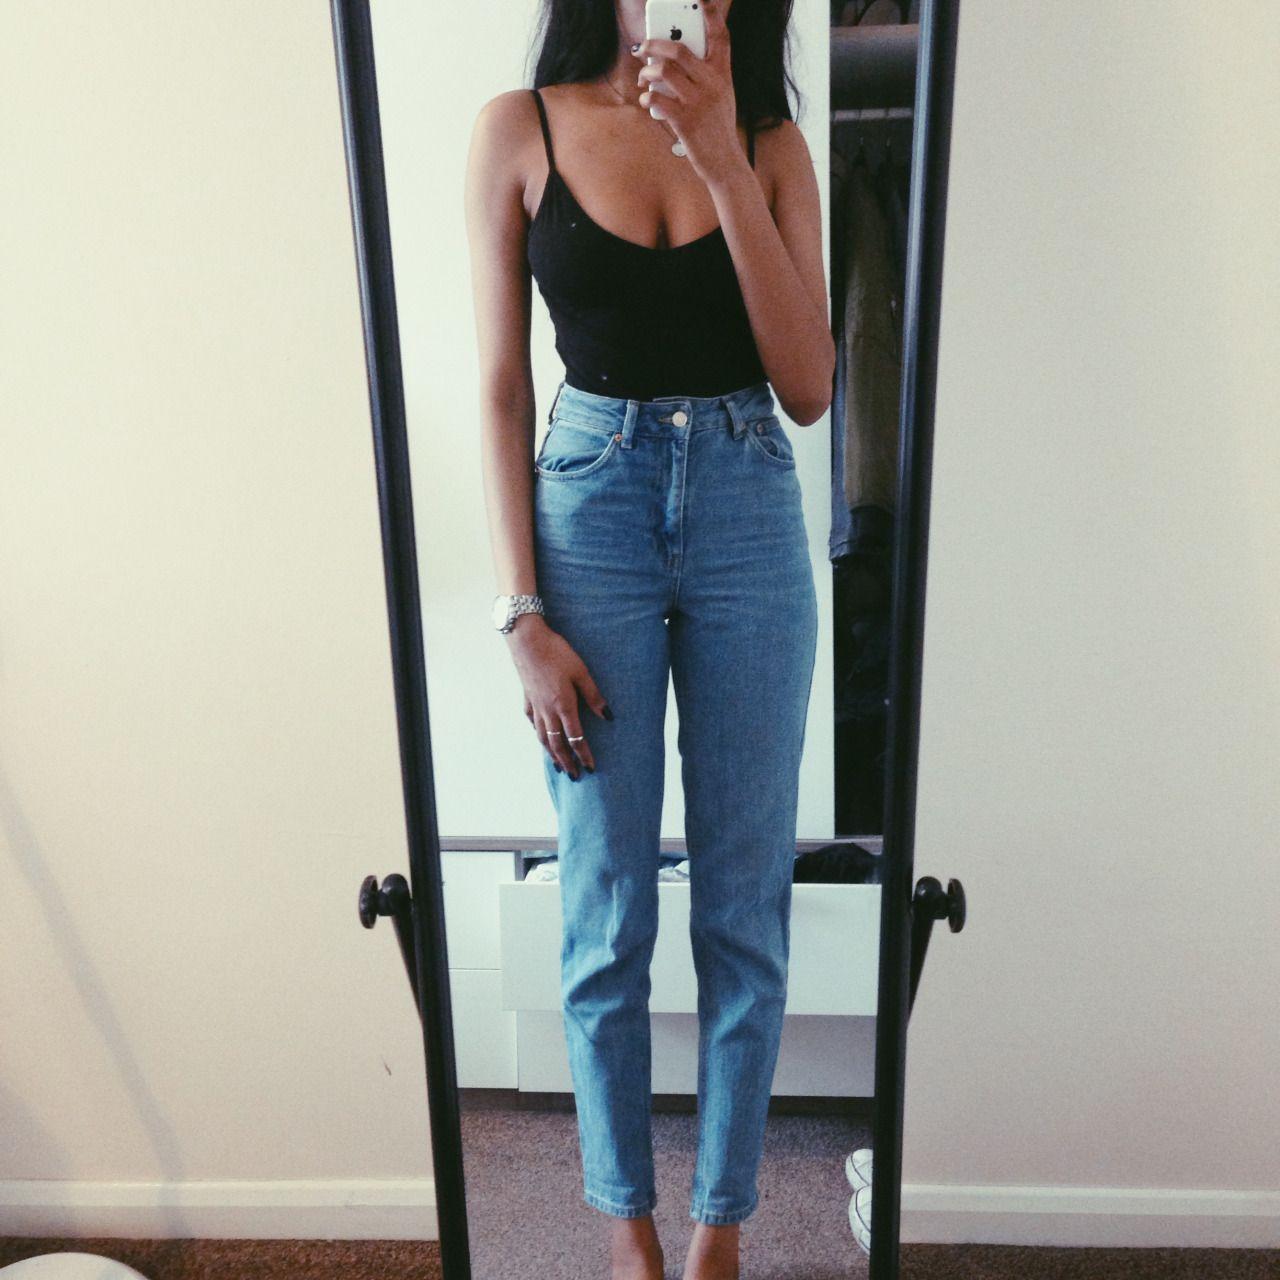 topshop moto mom jeans asos cami body outfit idea. Black Bedroom Furniture Sets. Home Design Ideas